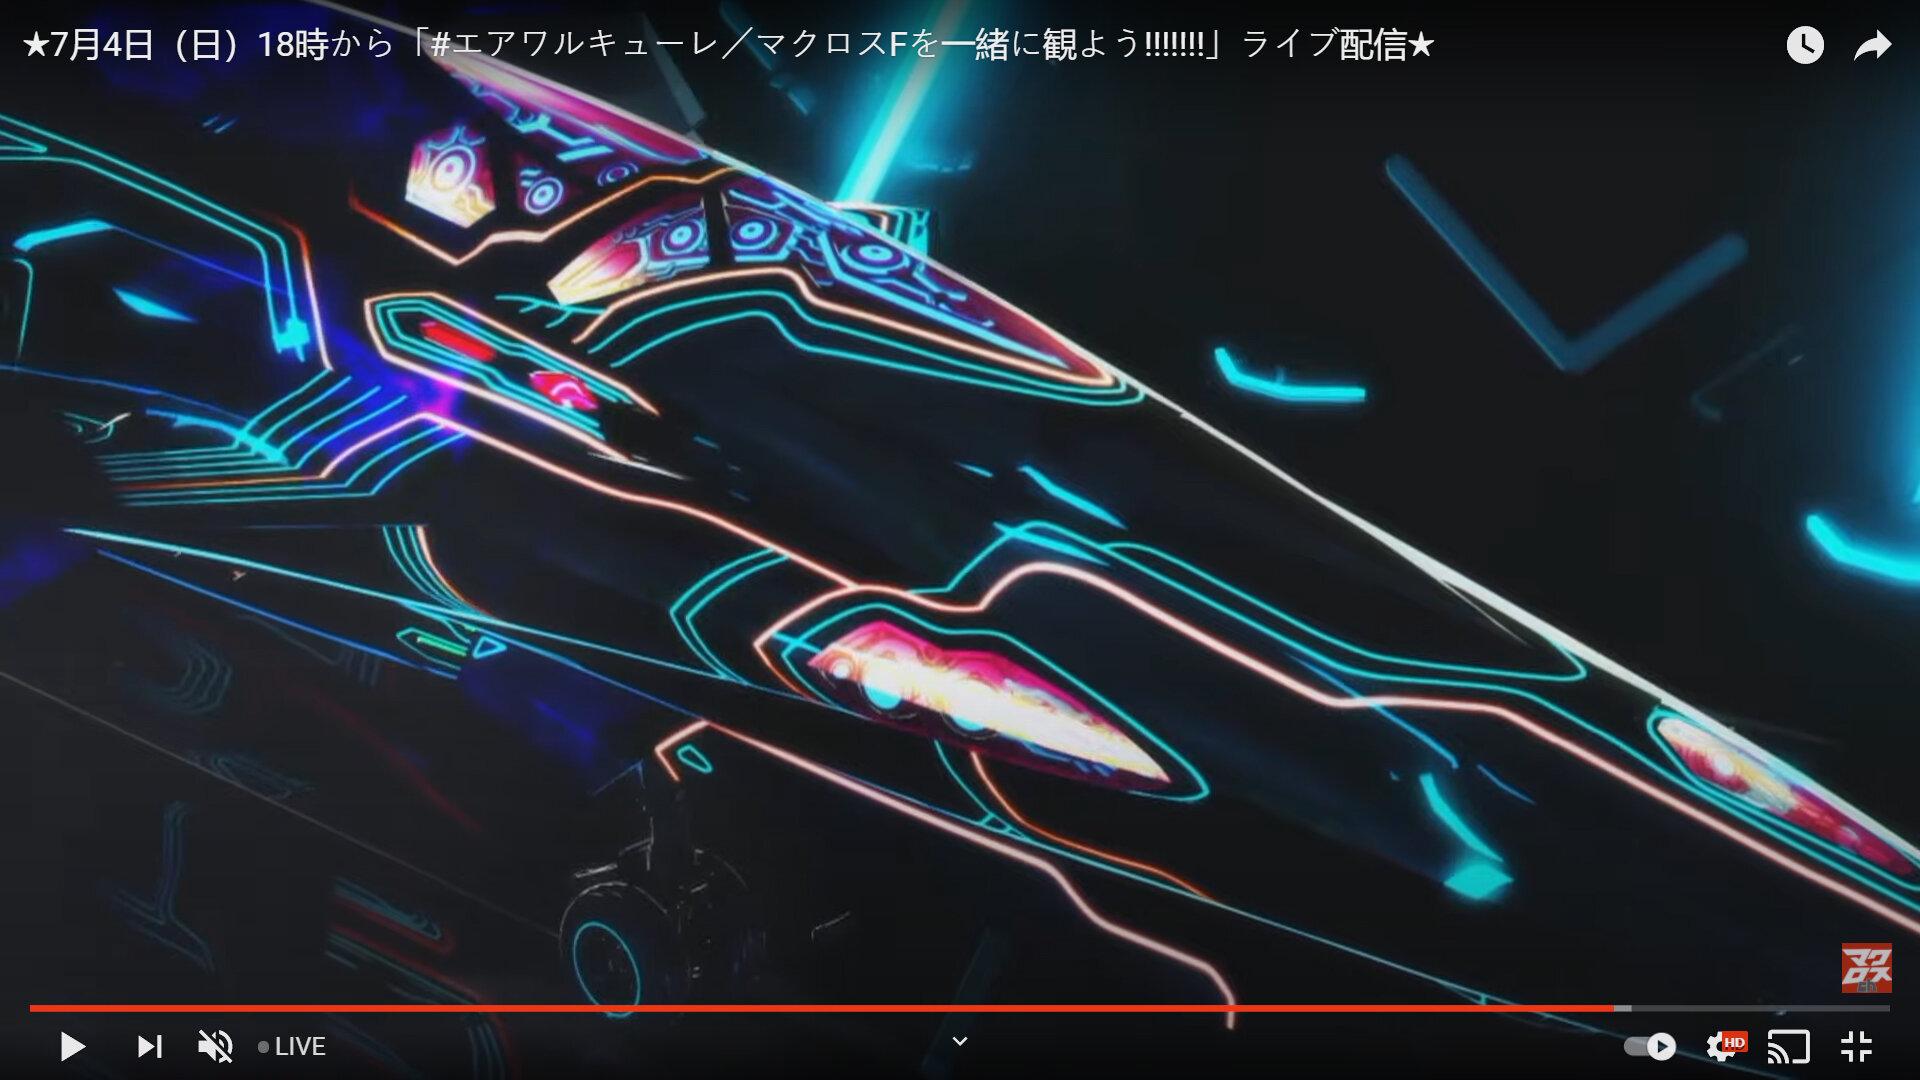 macross_delta_live_trailer5.jpg.239969c19b83131d21b2baf8b20d665f.jpg